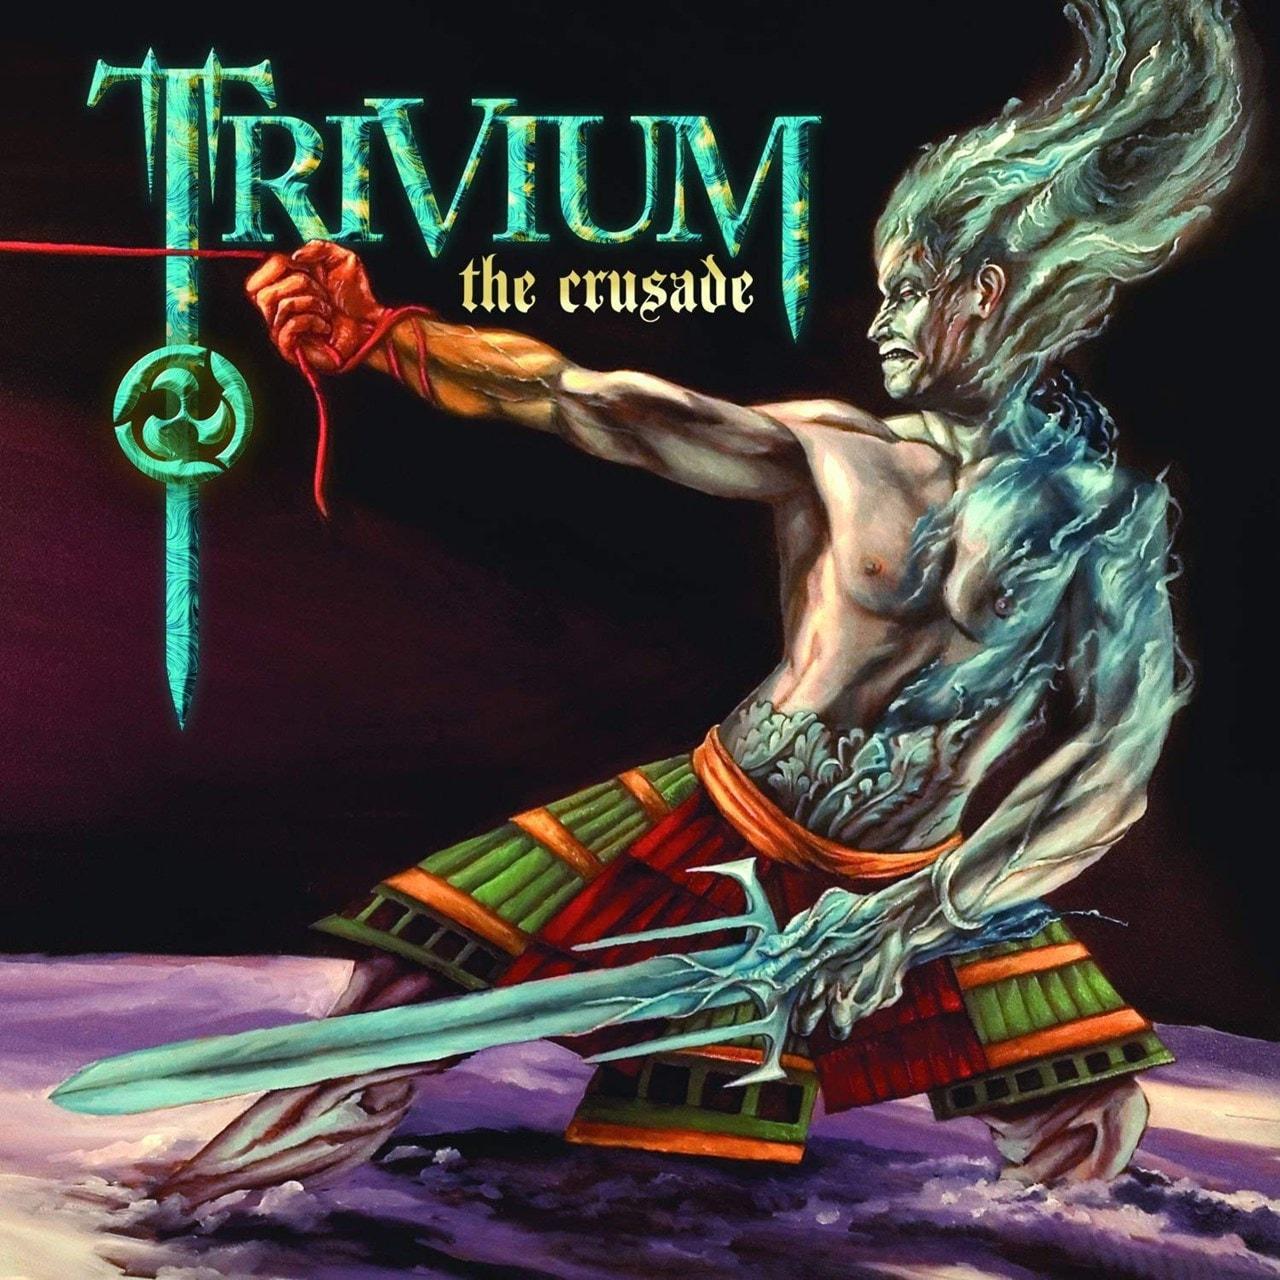 The Crusade - 1